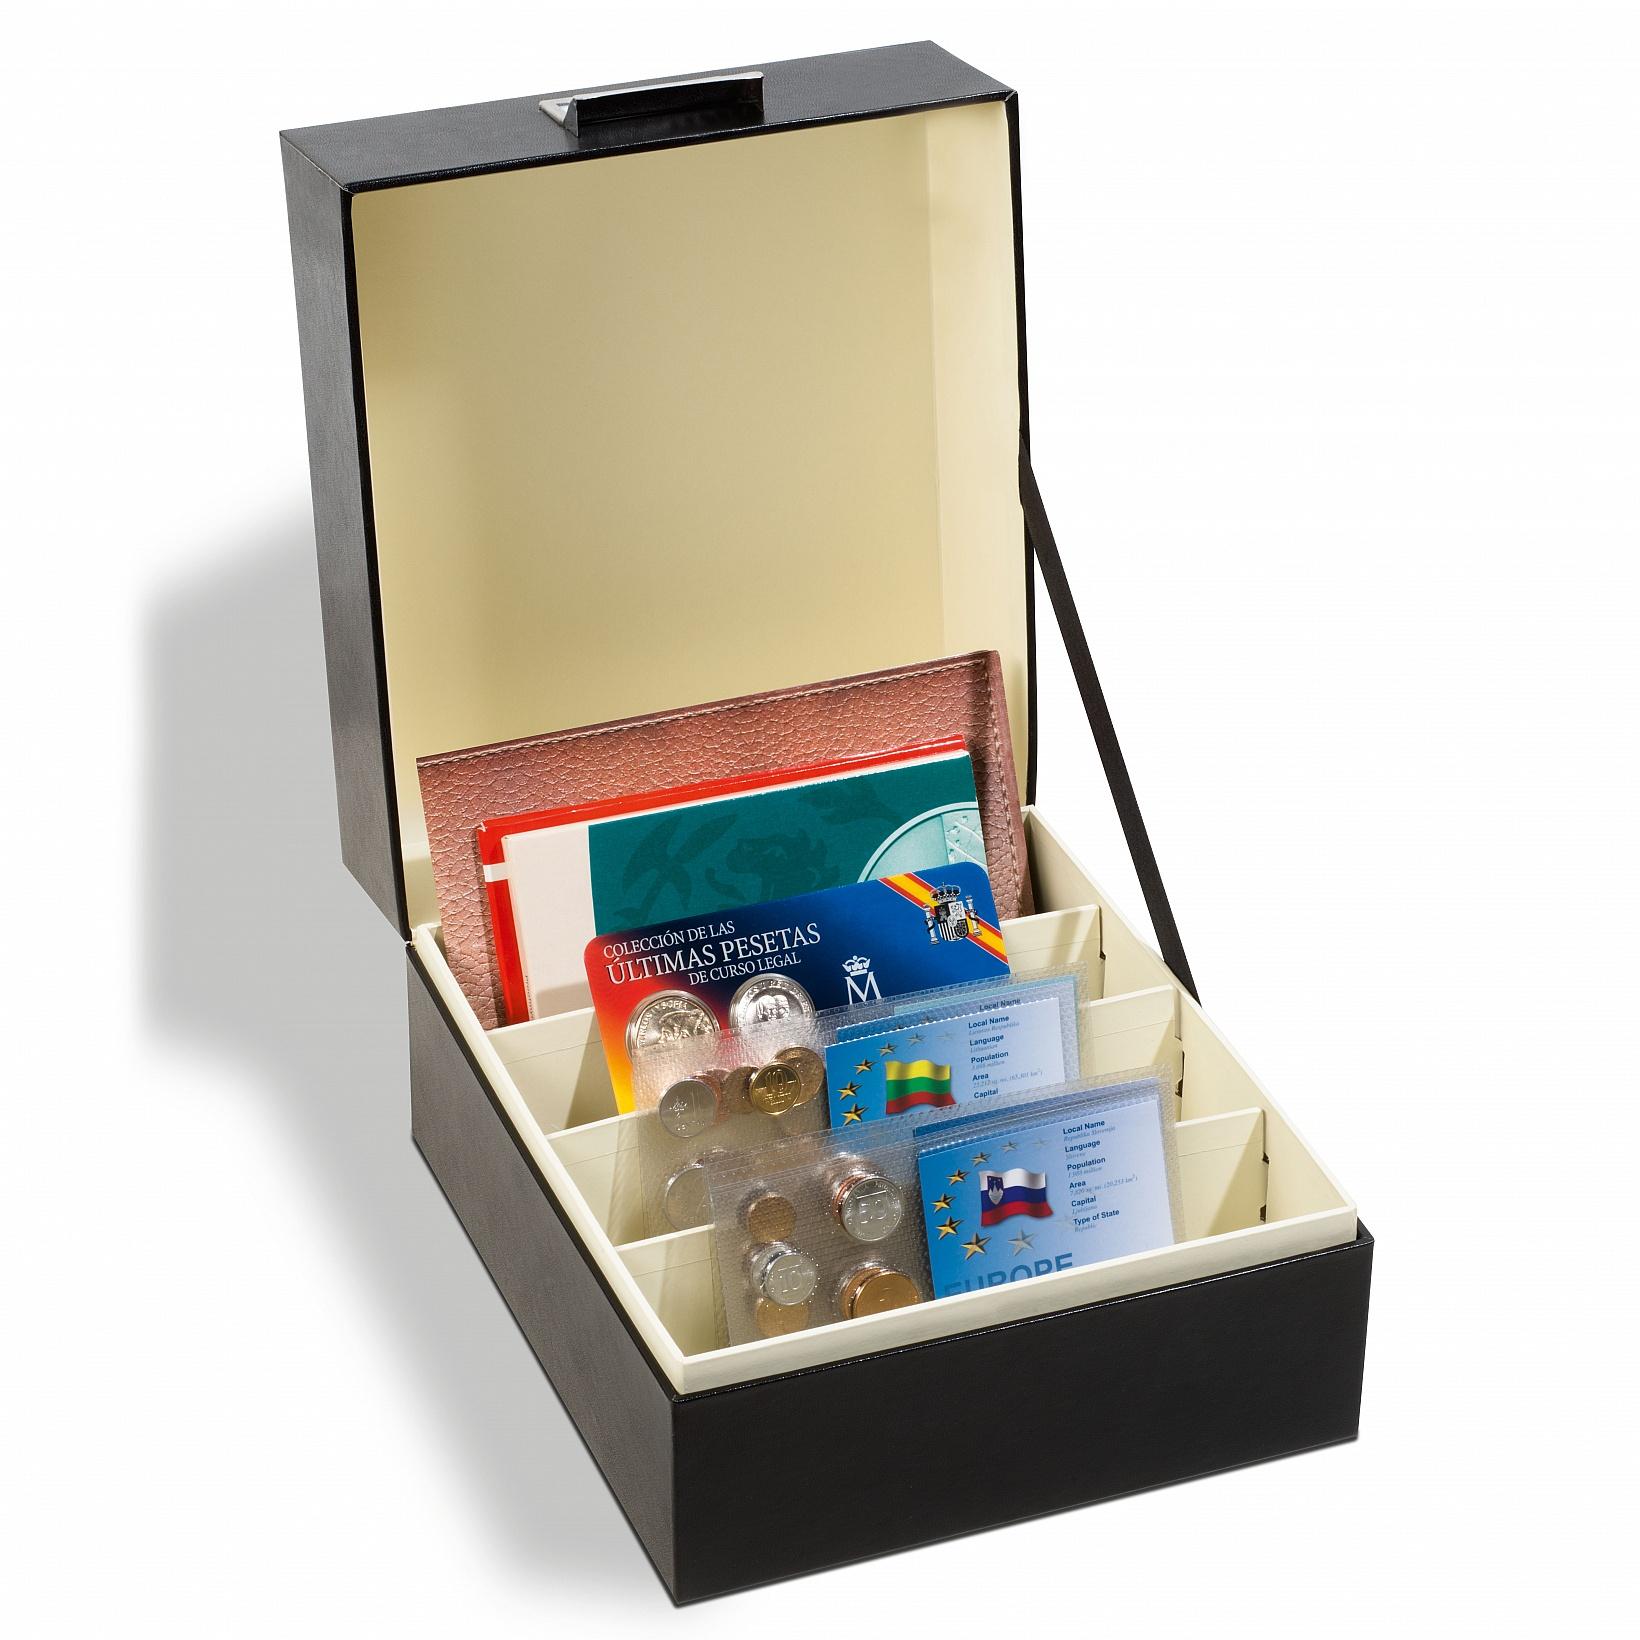 archive-box-logik-a5-inner-size-200-x-168-mm-black-5